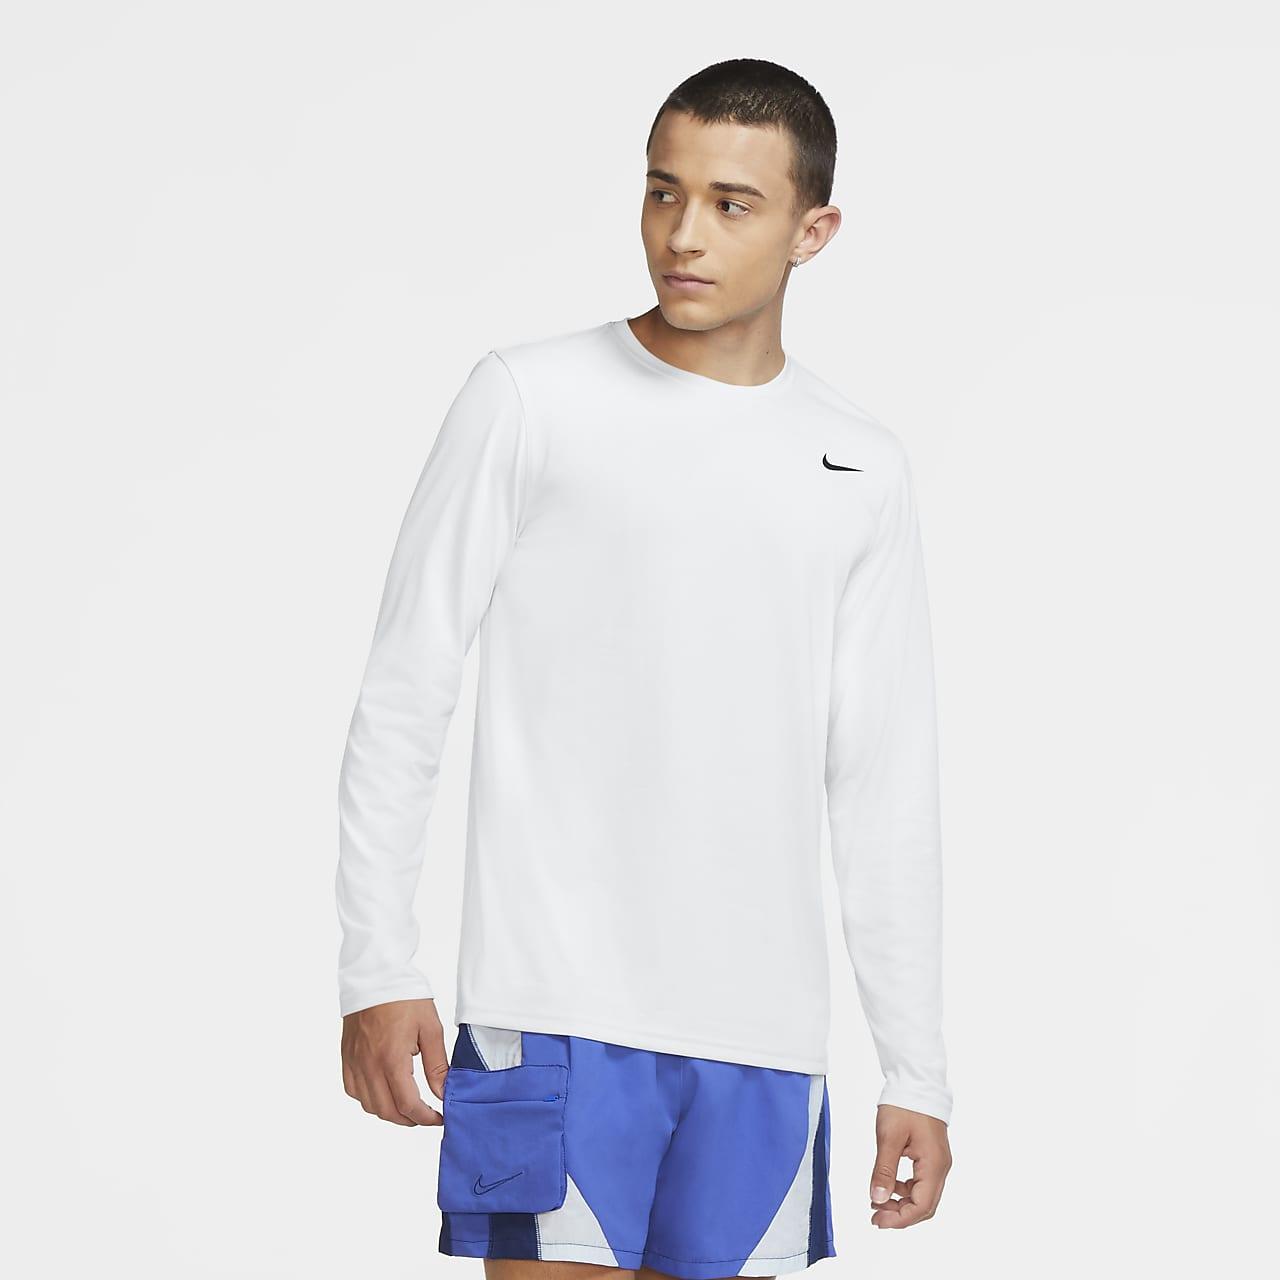 a32e6f68 Nike Dri-FIT Legend 2.0 Men's Long-Sleeve Training Top. Nike.com